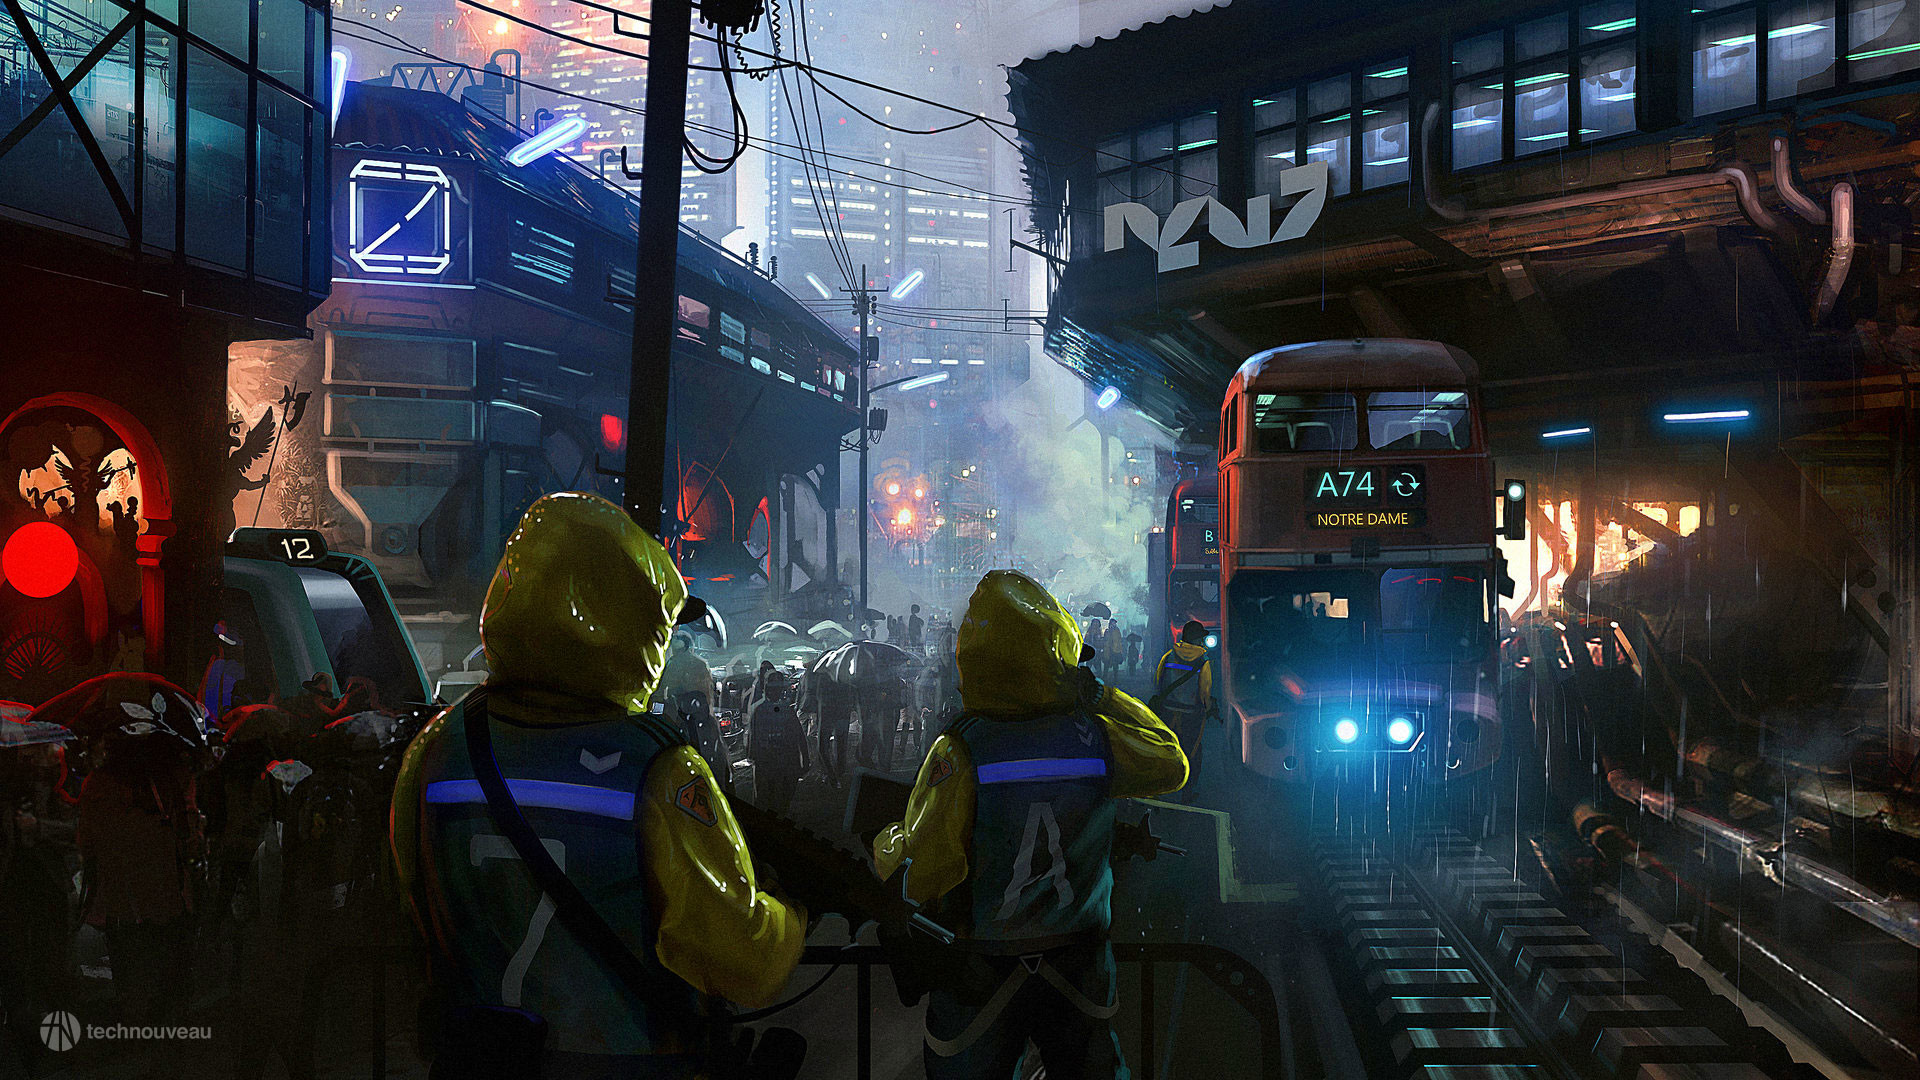 Rasmus poulsen cyberpunk city fullrez 2